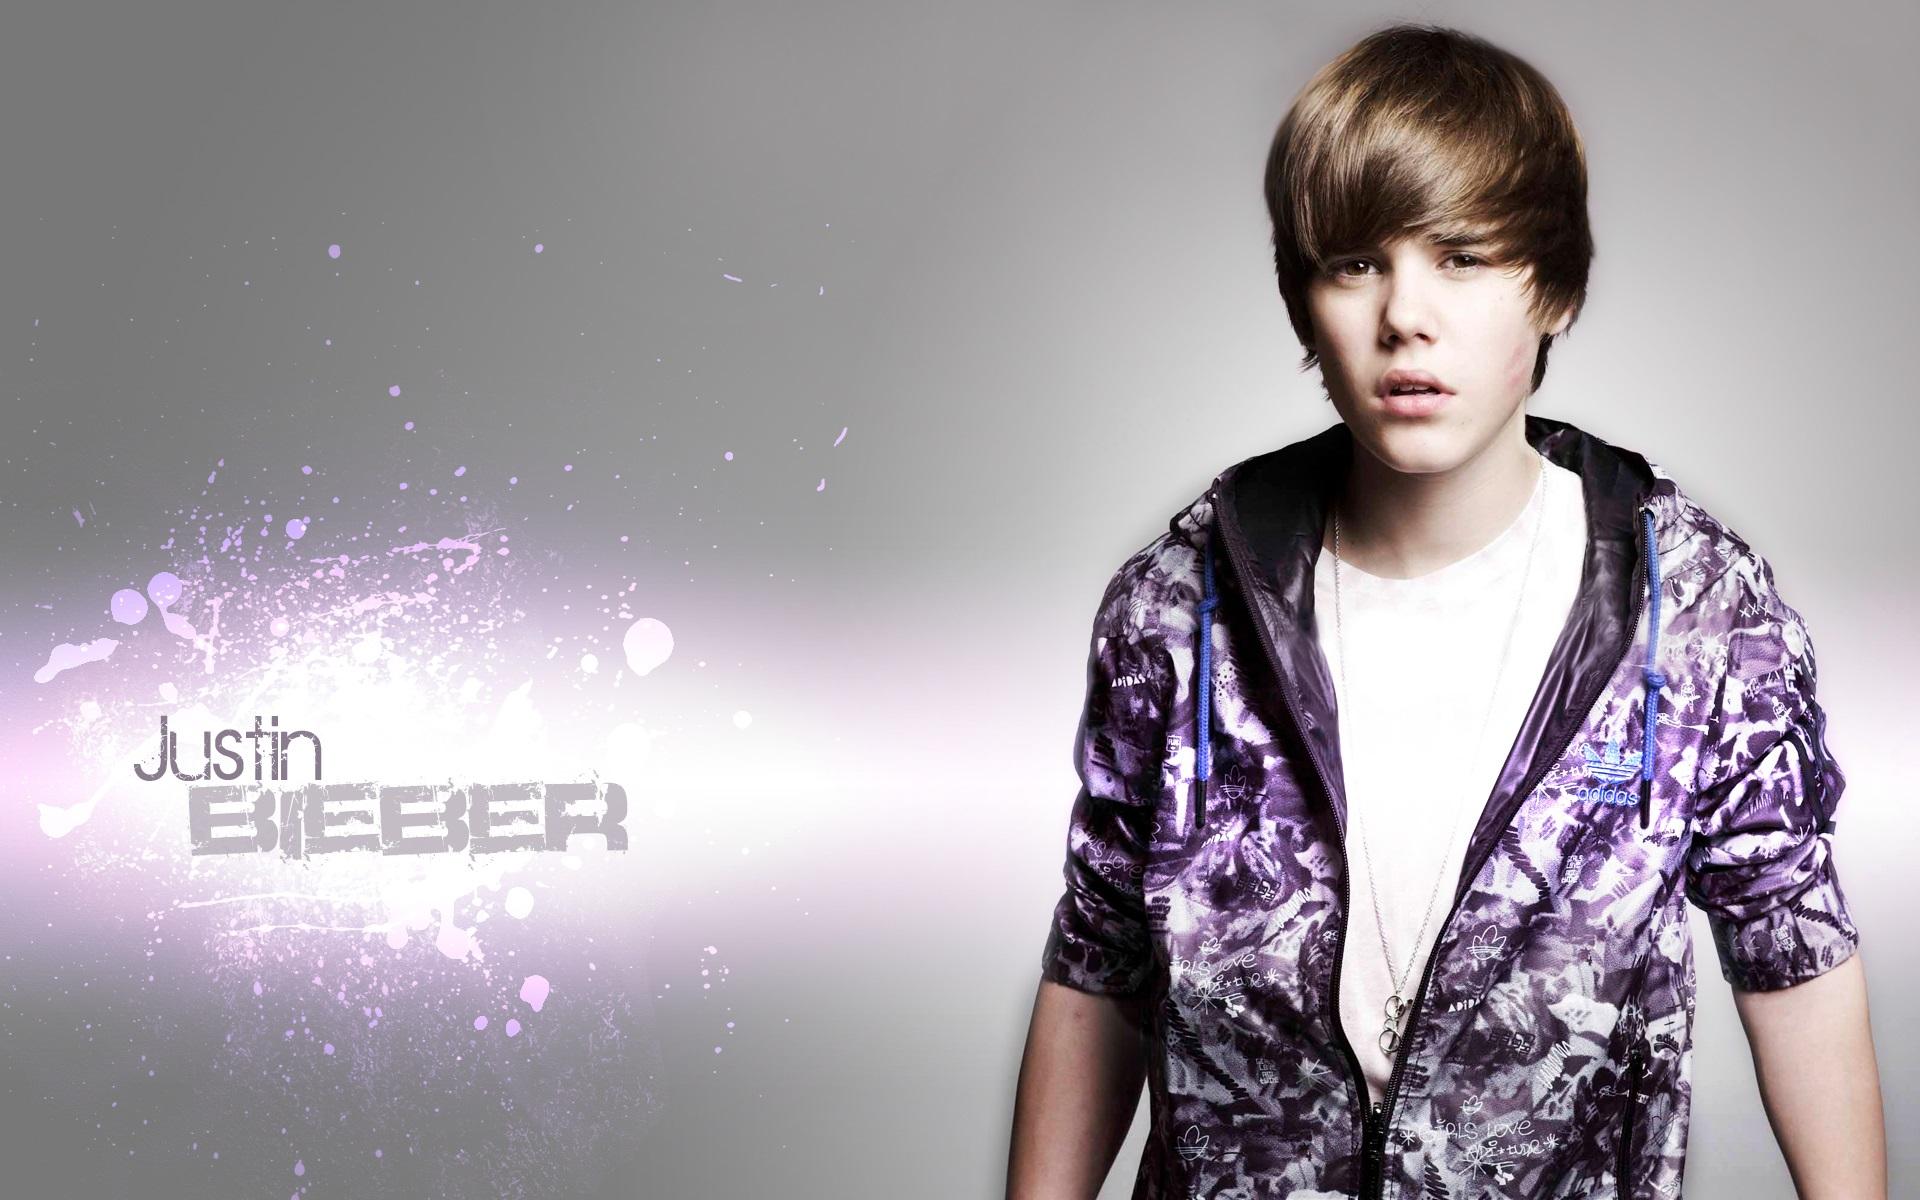 Justin Bieber Wallpaper 5